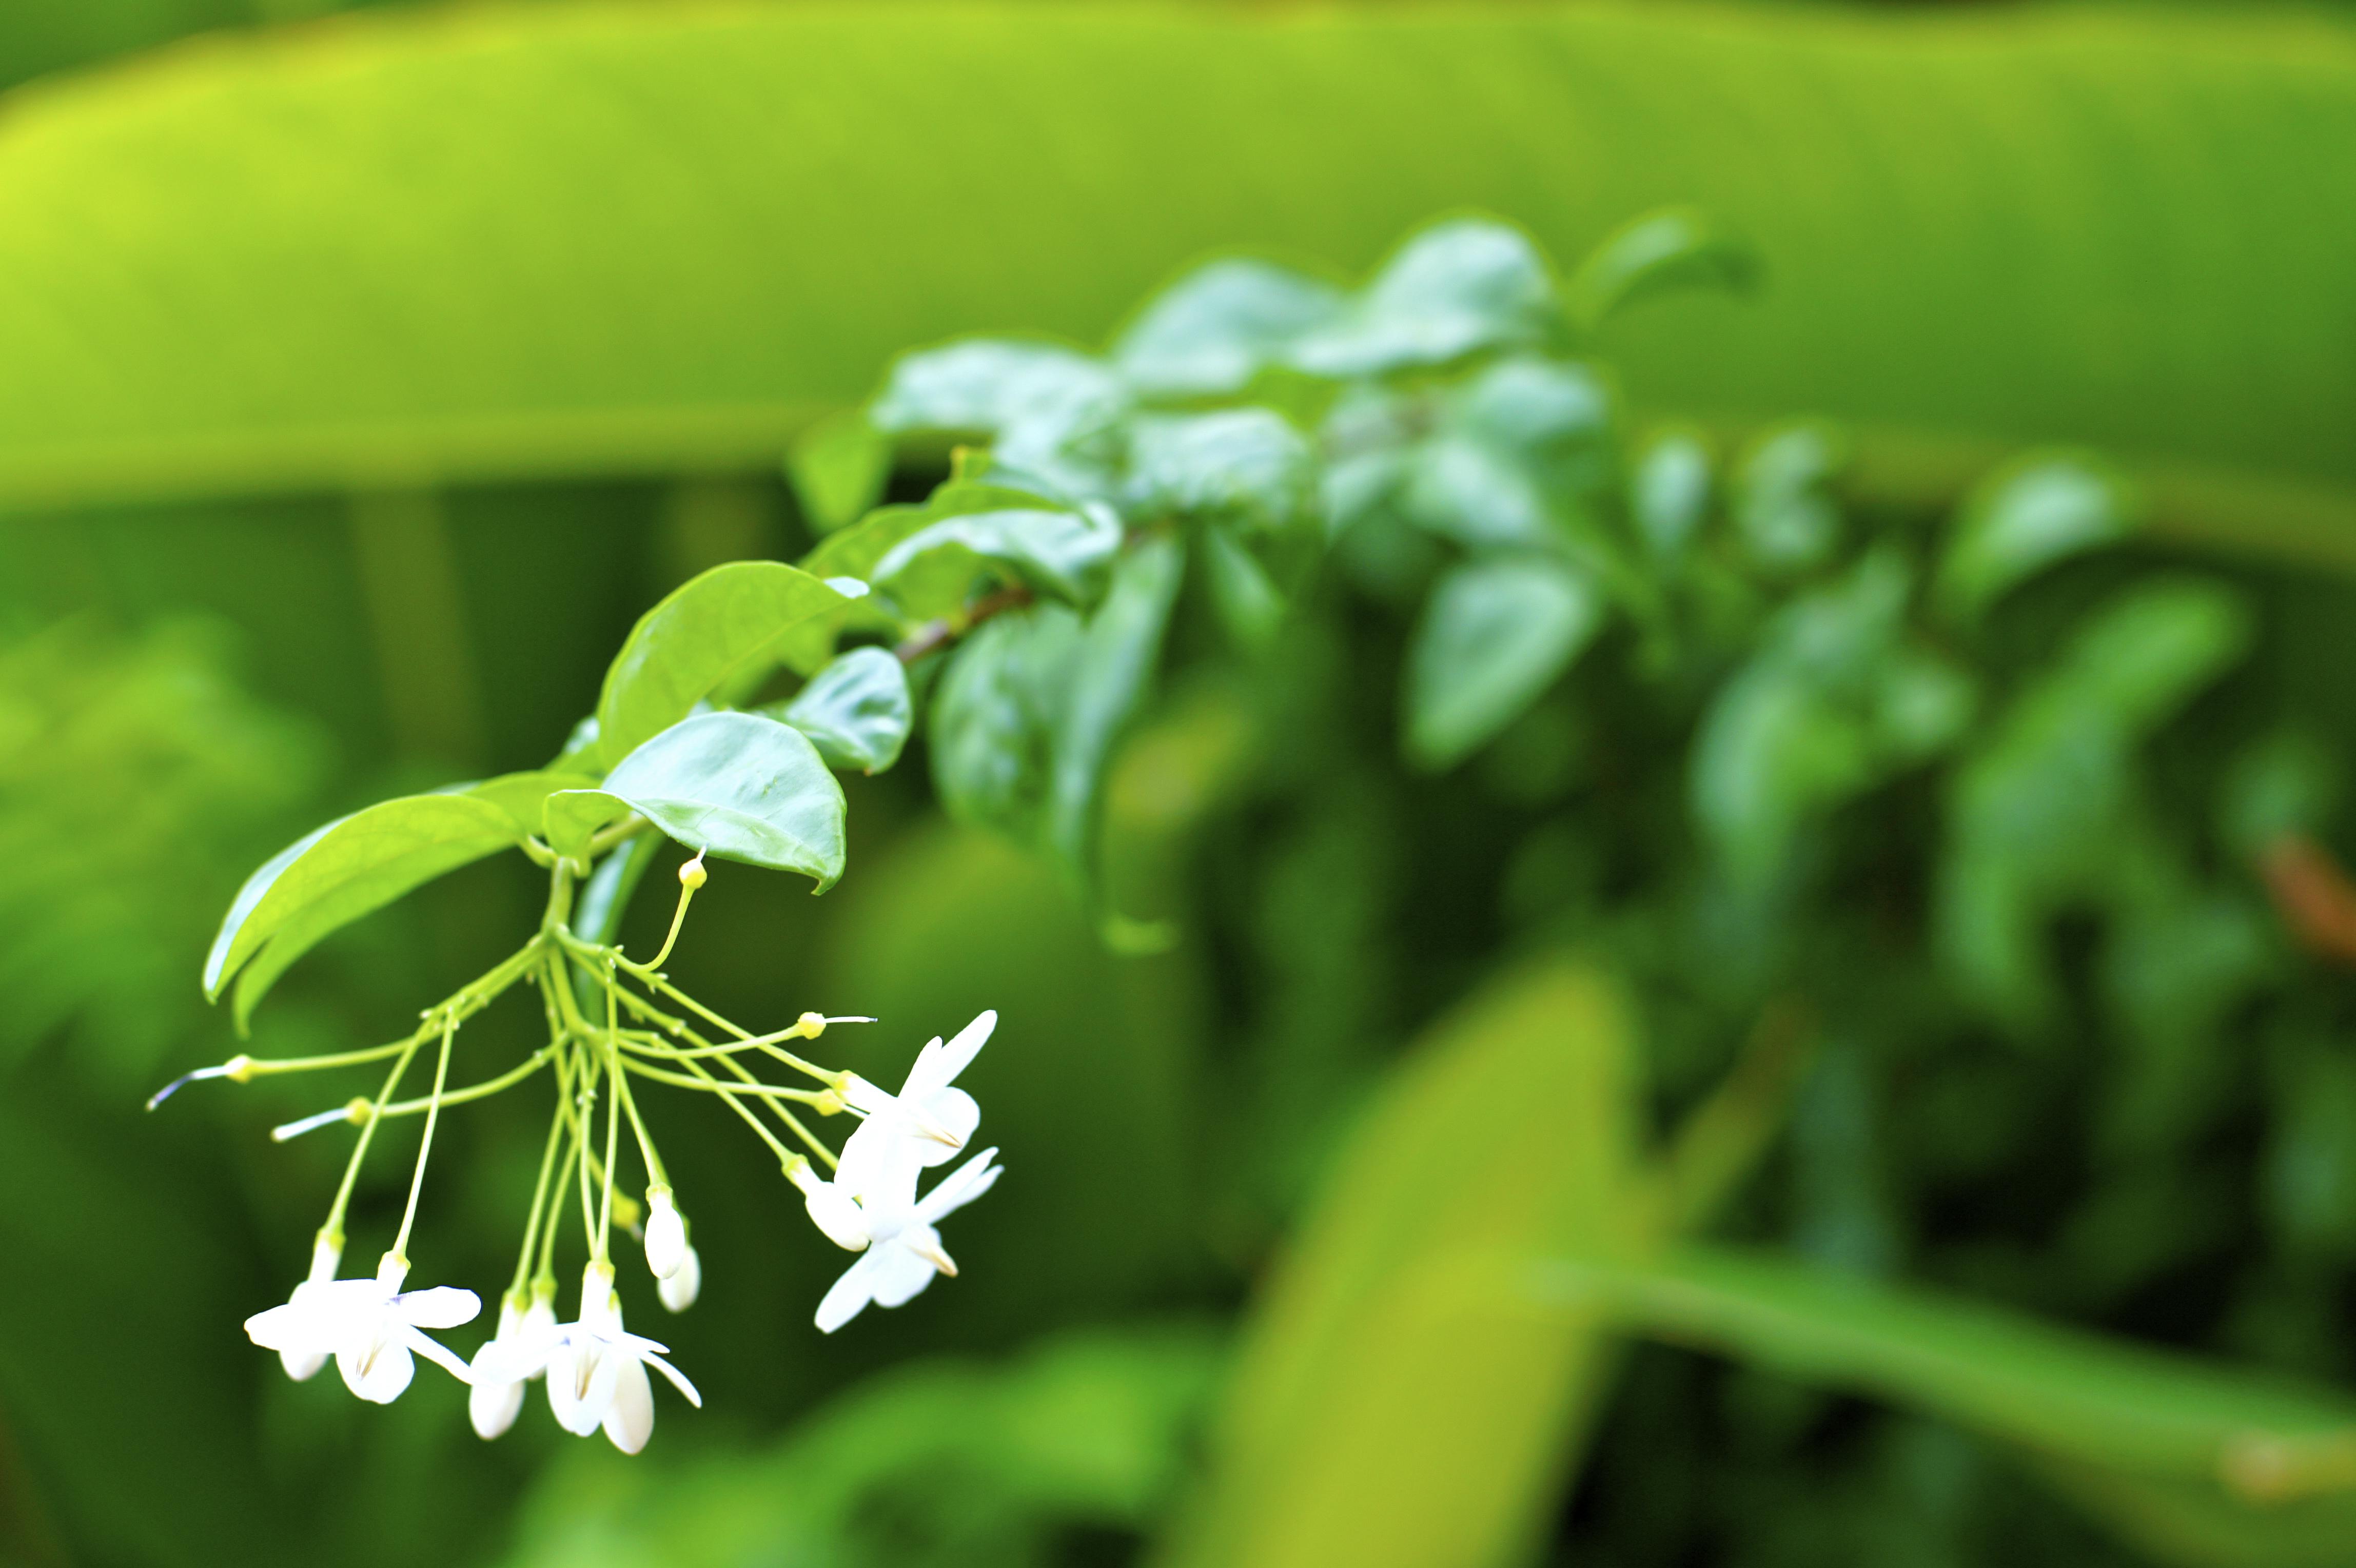 Green flower, Bloom, Flower, Green, Nature, HQ Photo